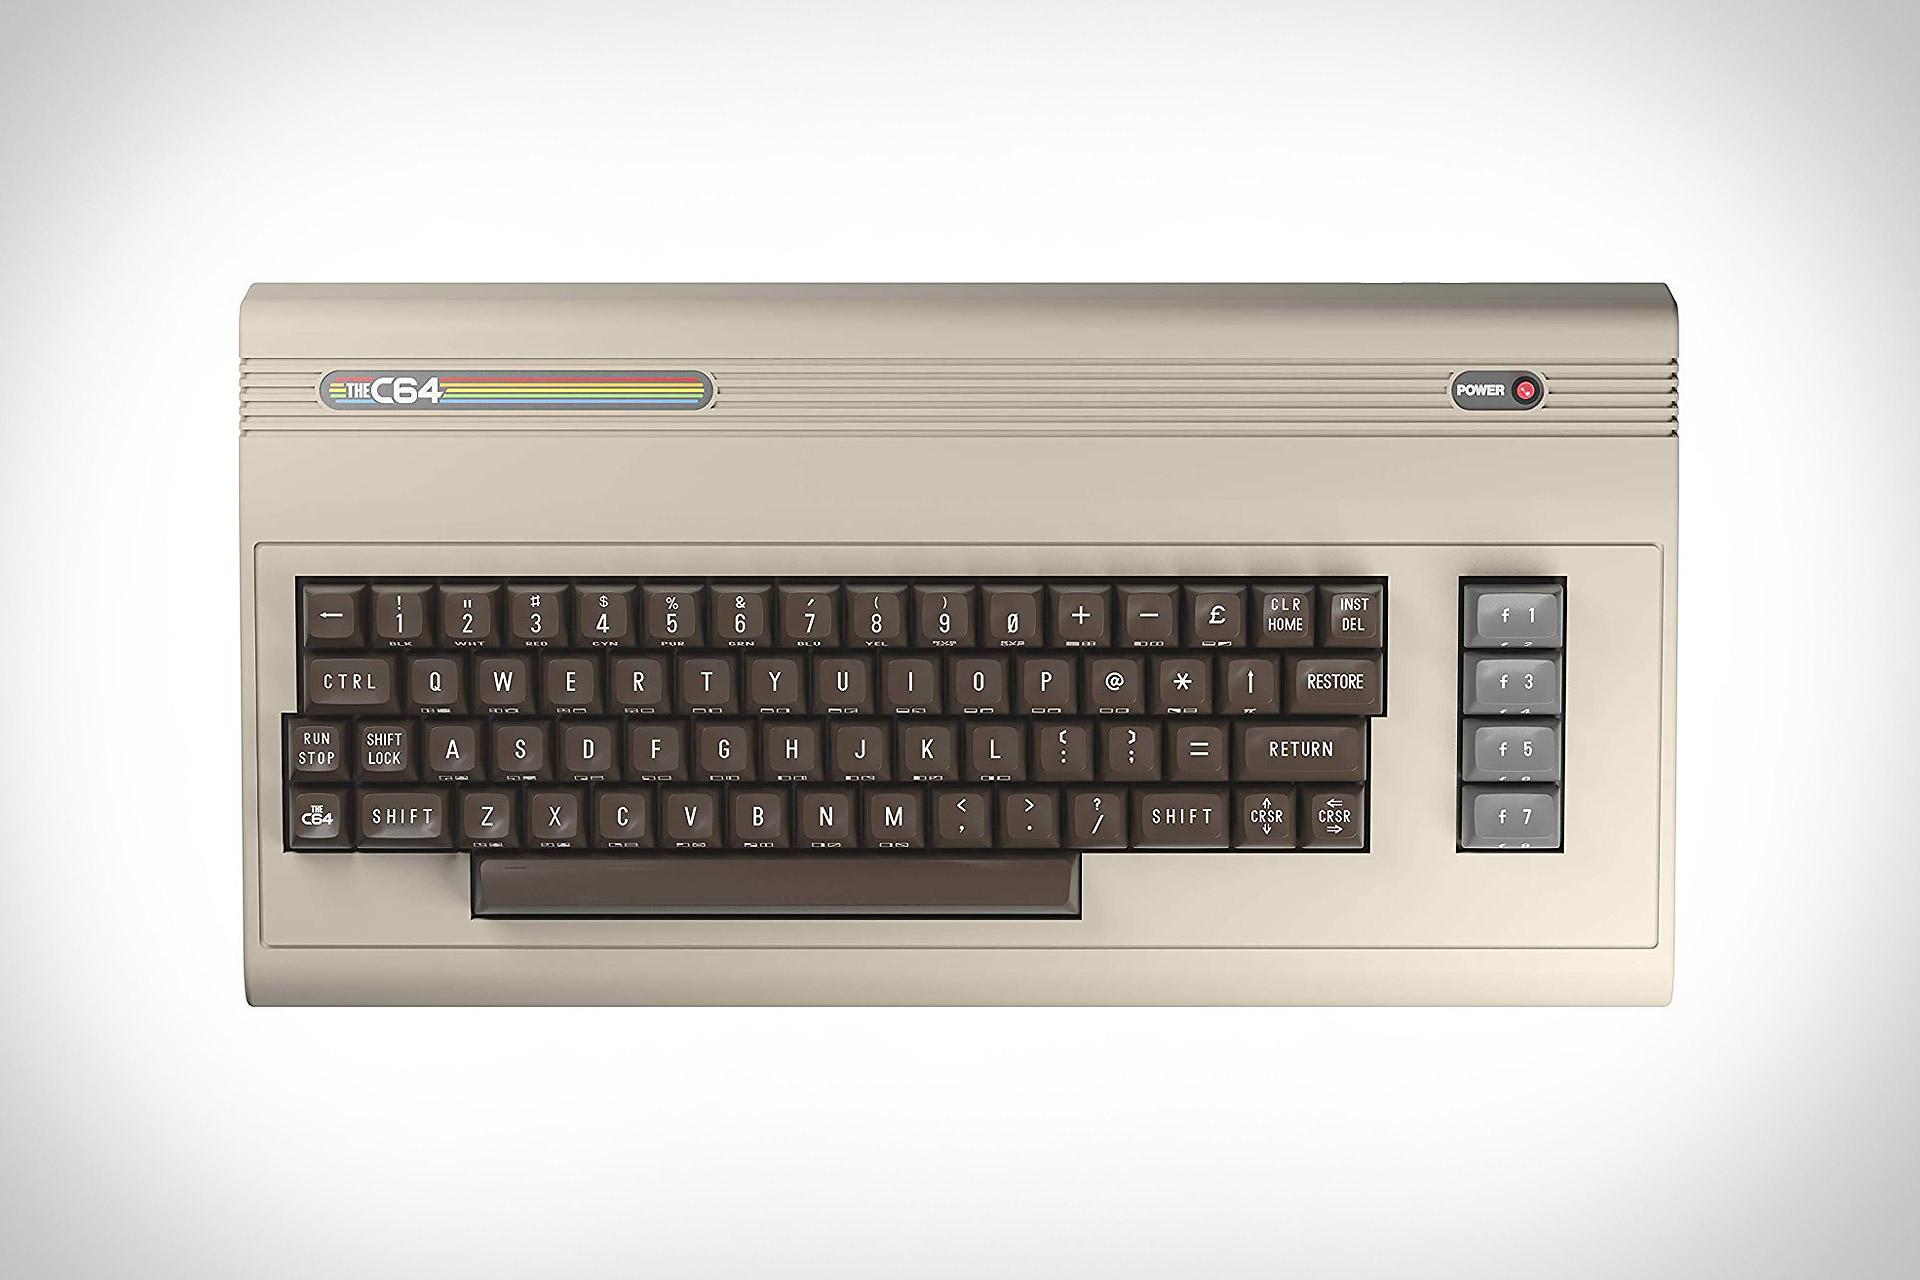 C64 Home Computer